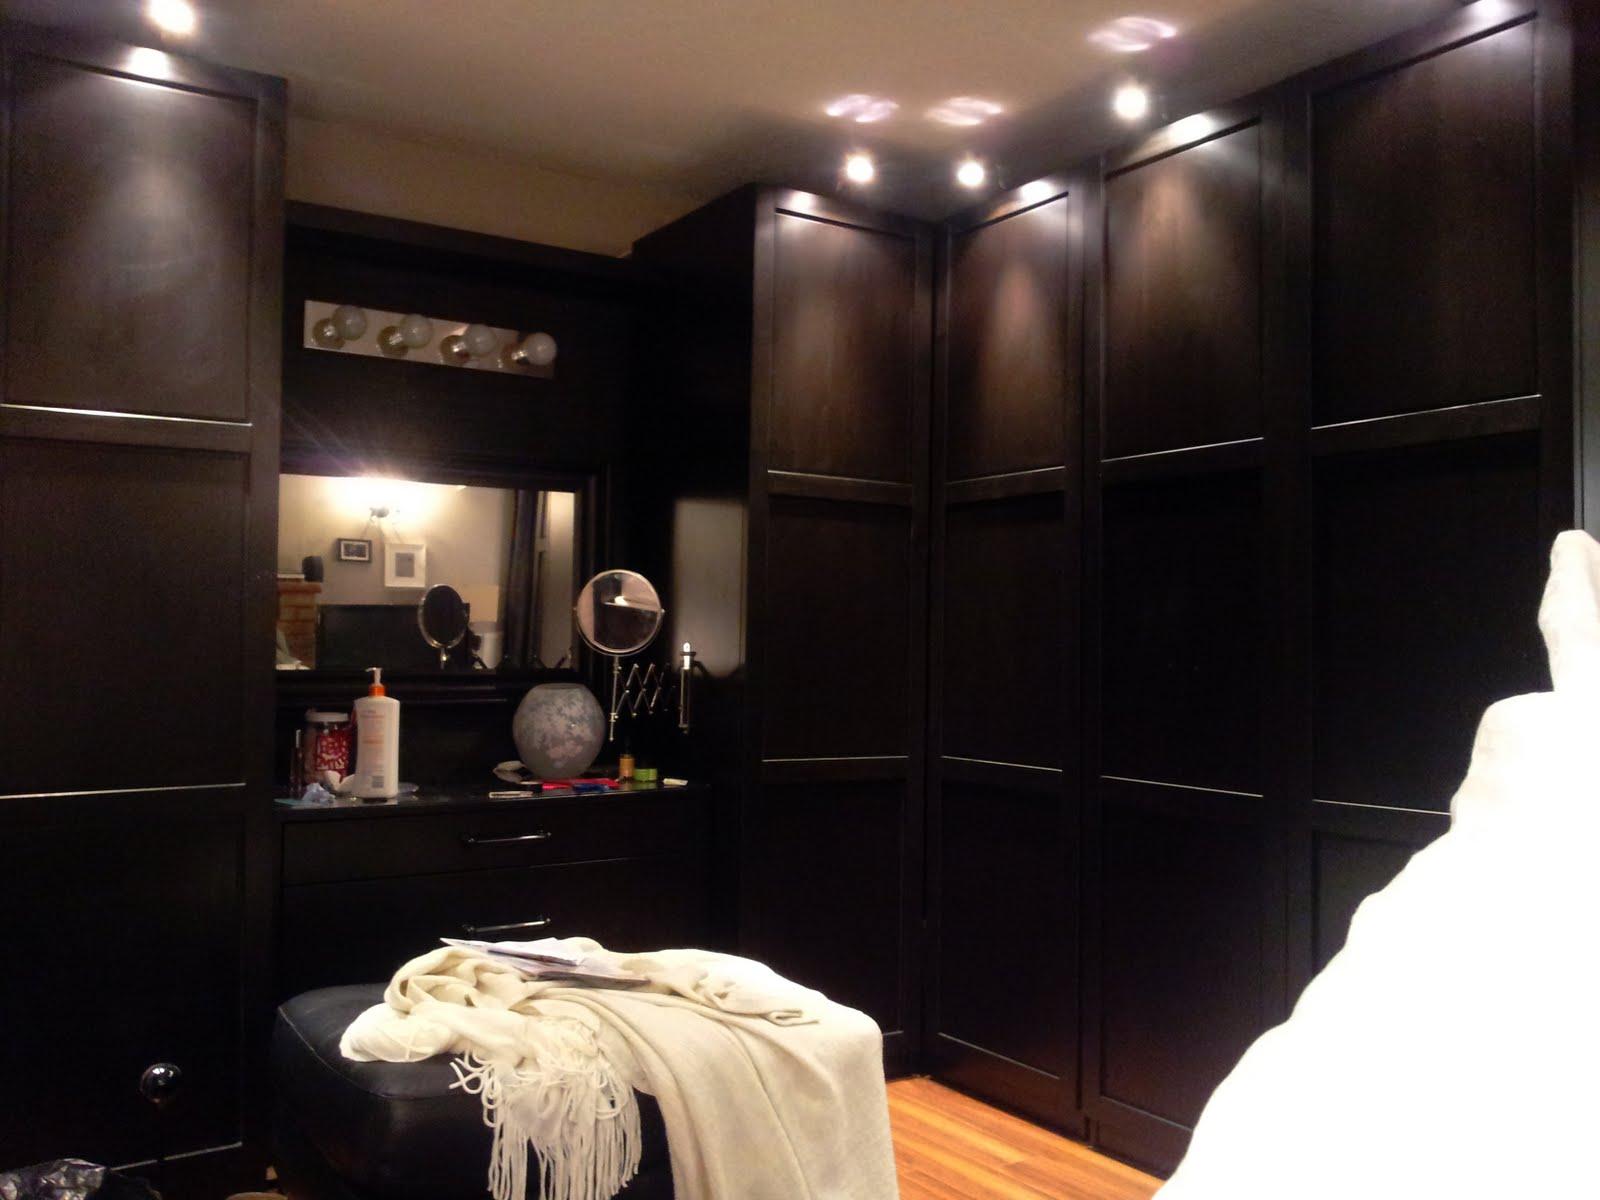 ikea wardrobe lighting. Ikea Wardrobe Lighting O